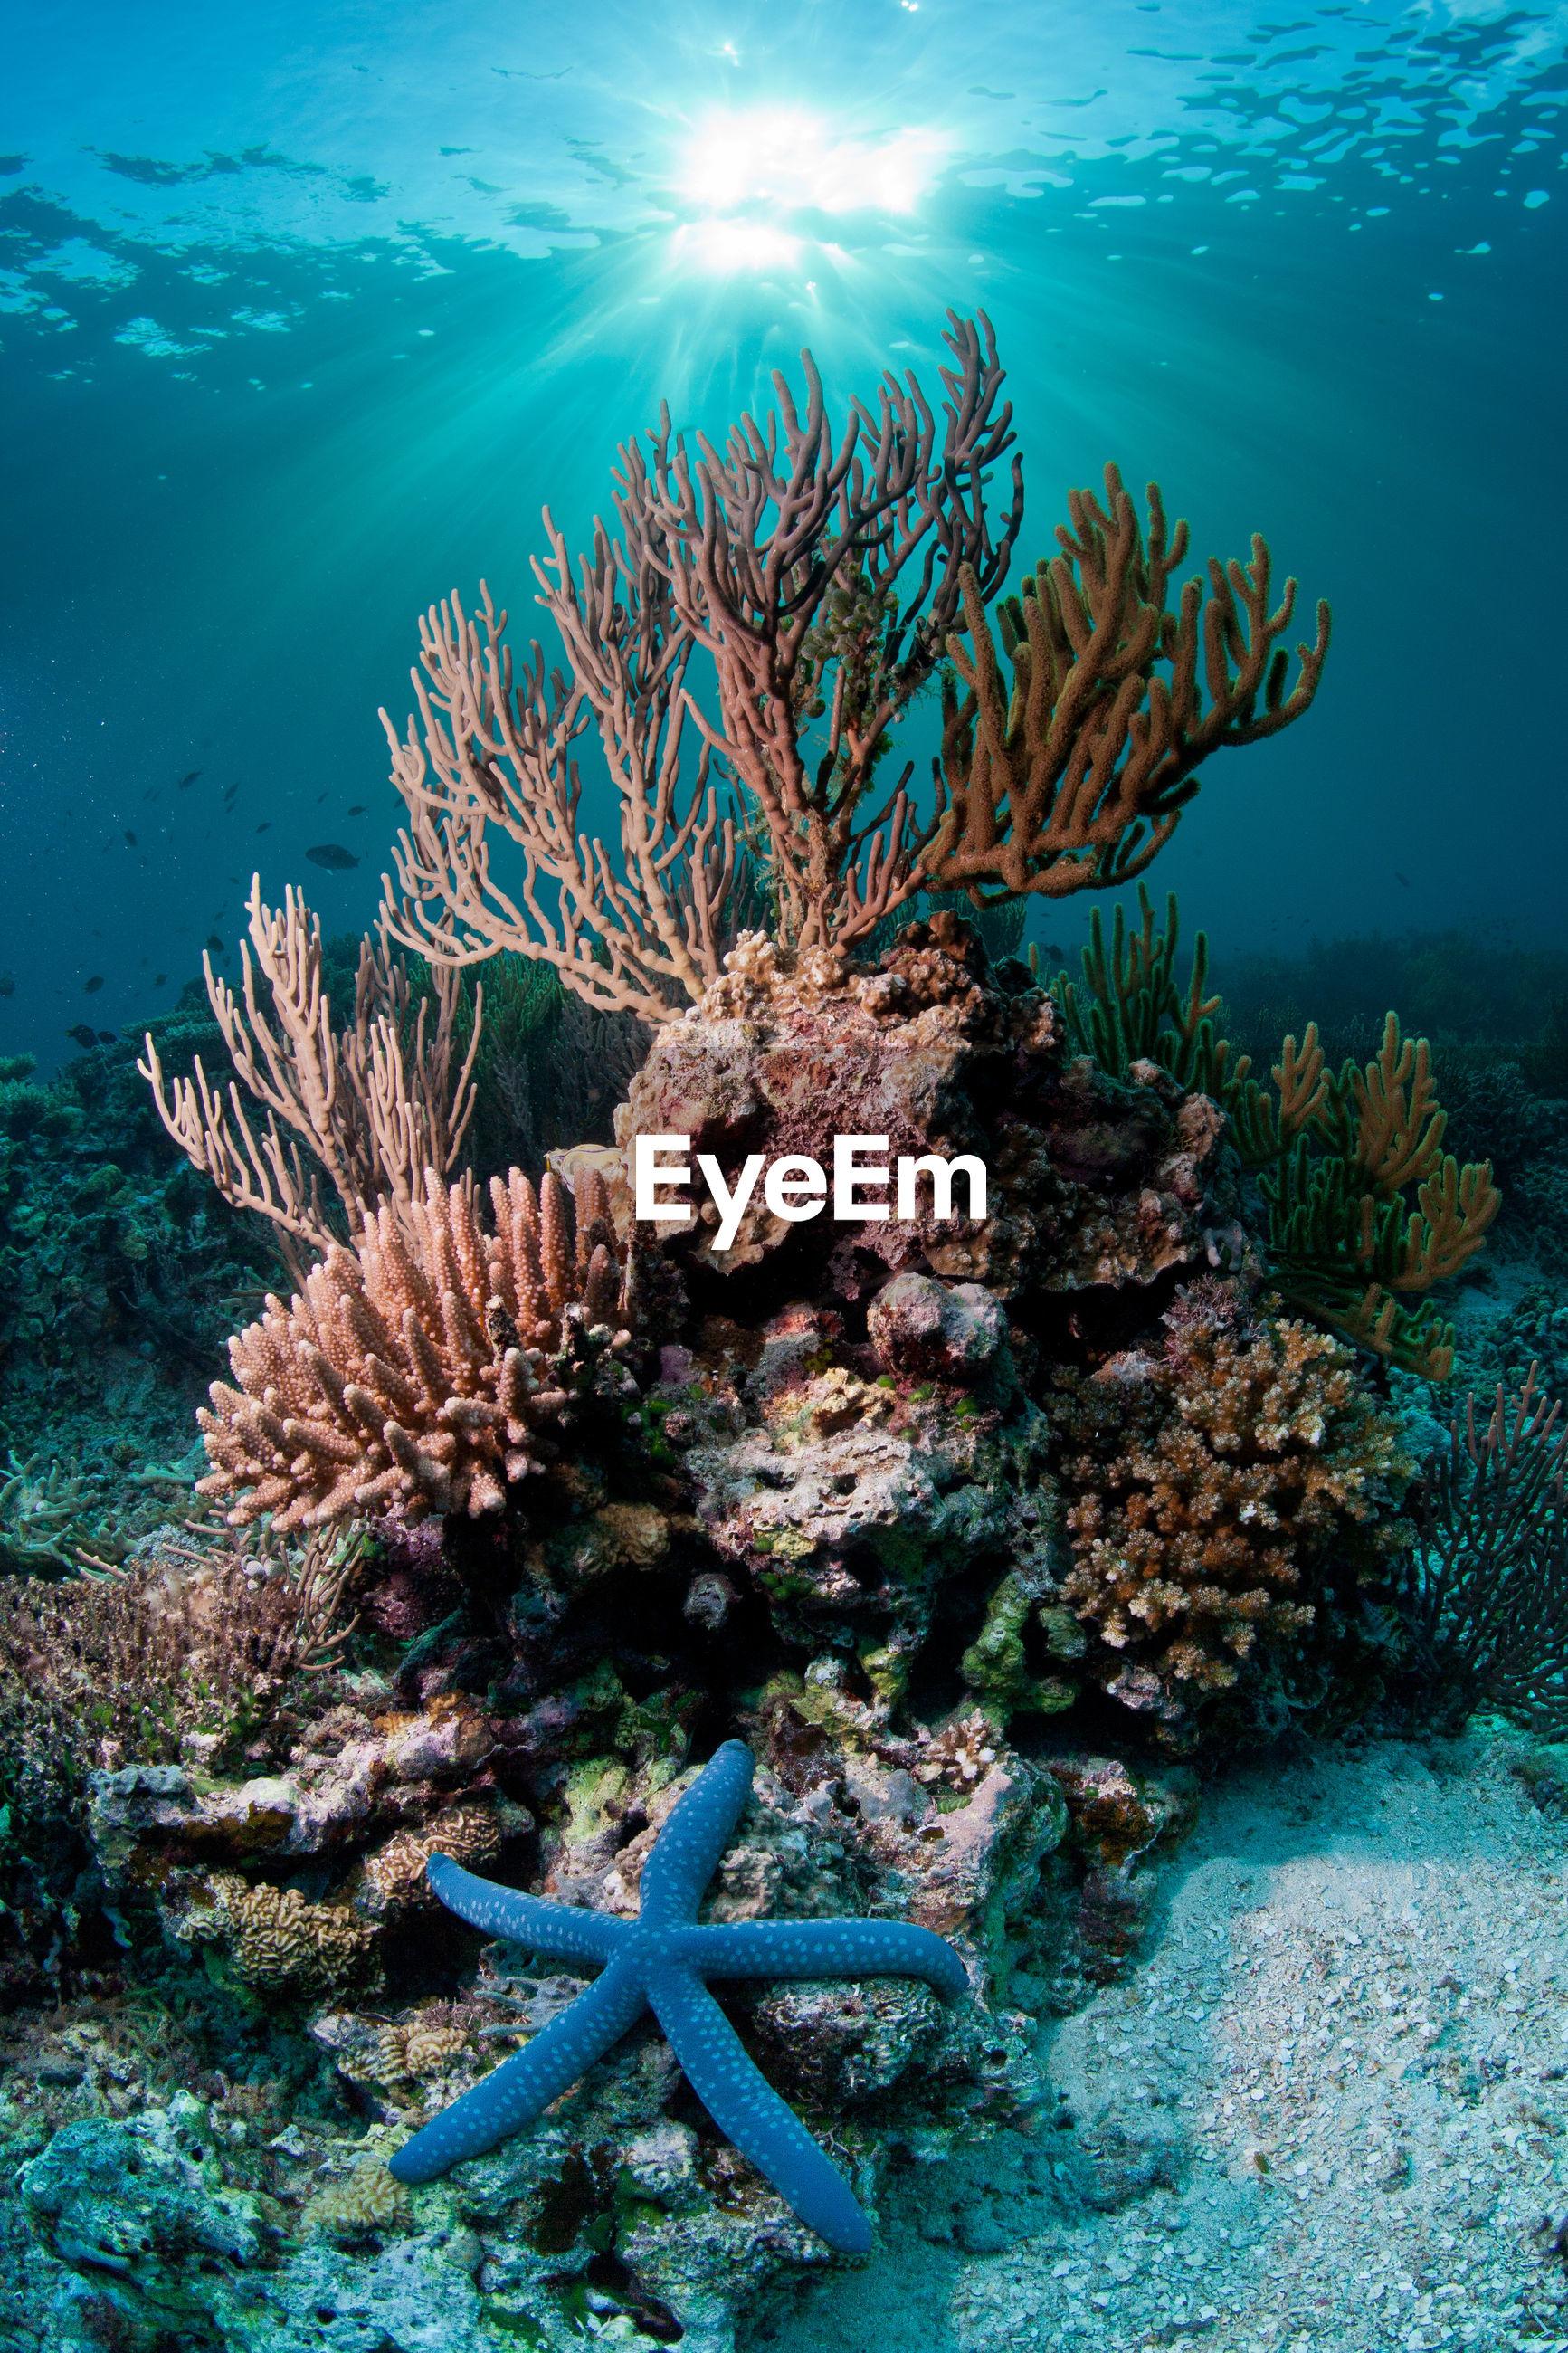 Starfish next to corals underwater